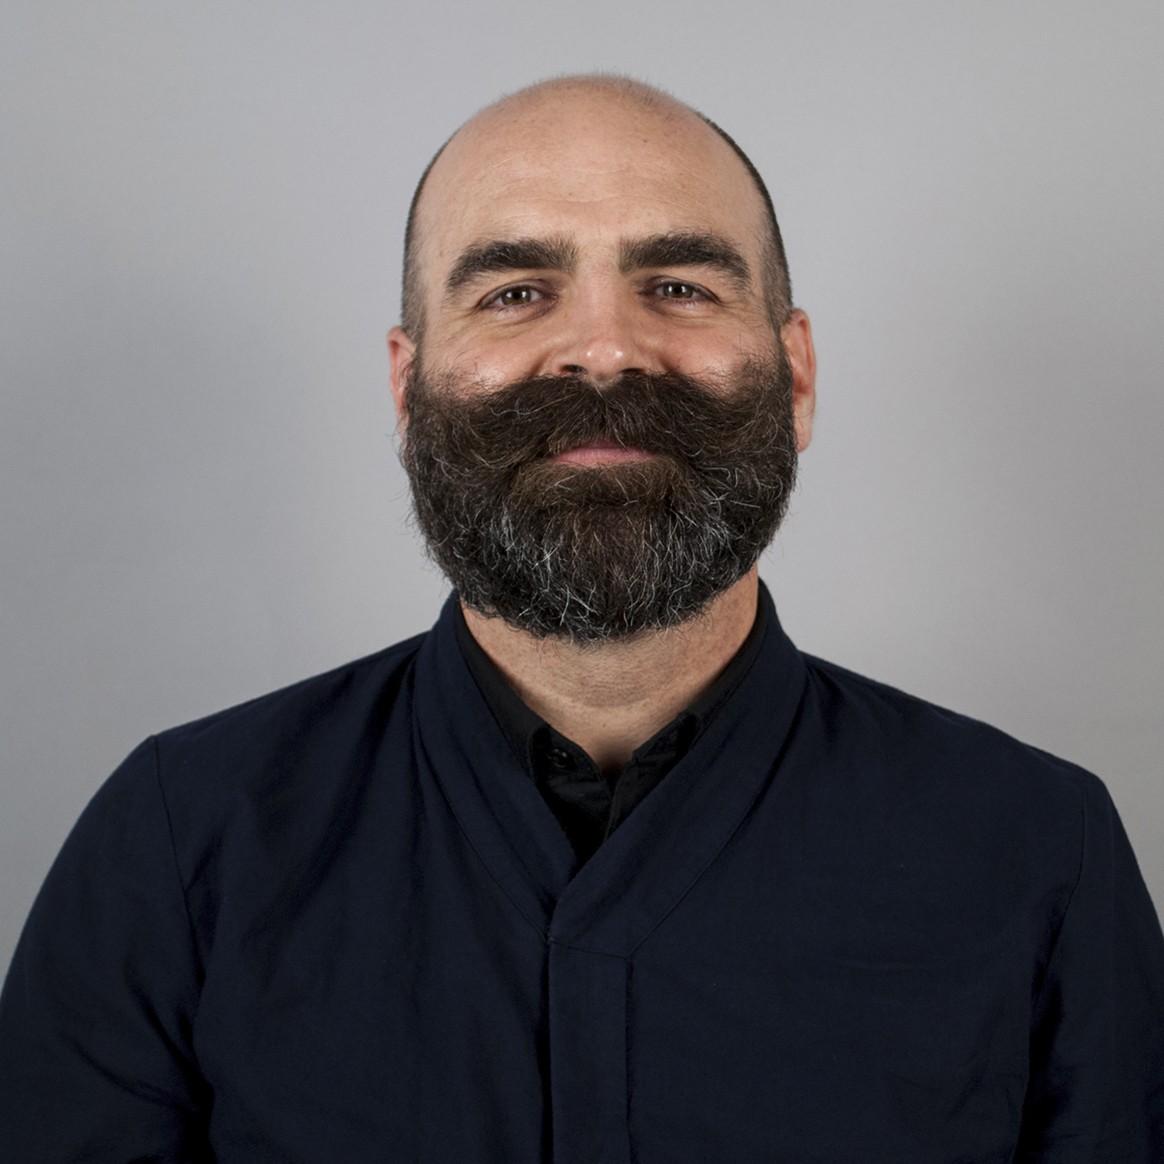 Head shot of Tenured Penn State Department of Architecture Associate Professor Marcus Shaffer